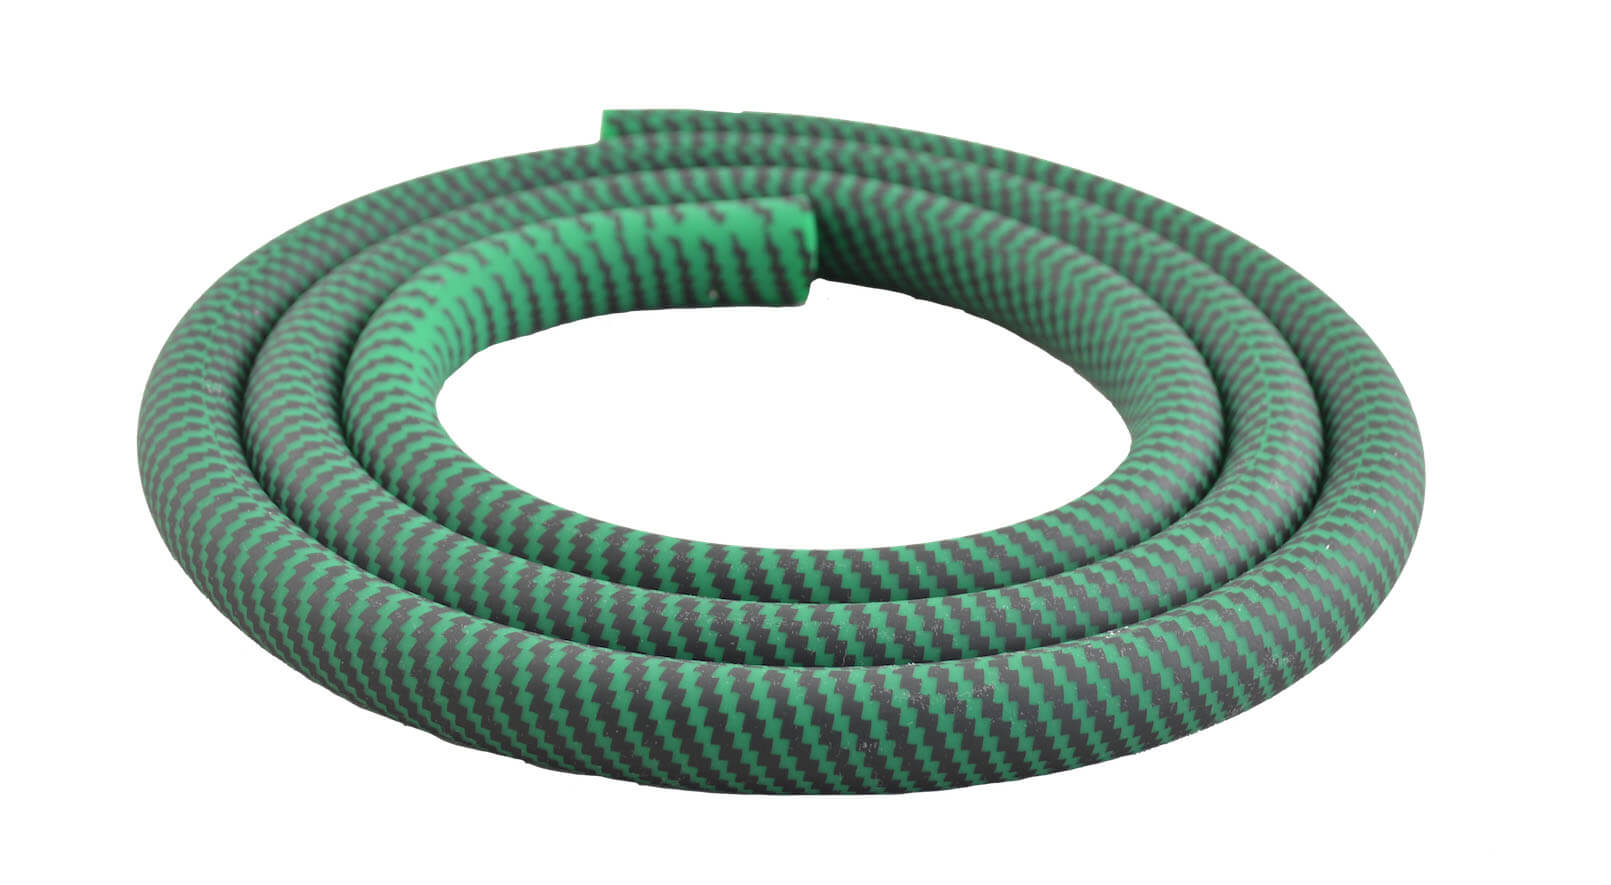 Silikonschlauch Soft Touch Carbonoptik (Grün)